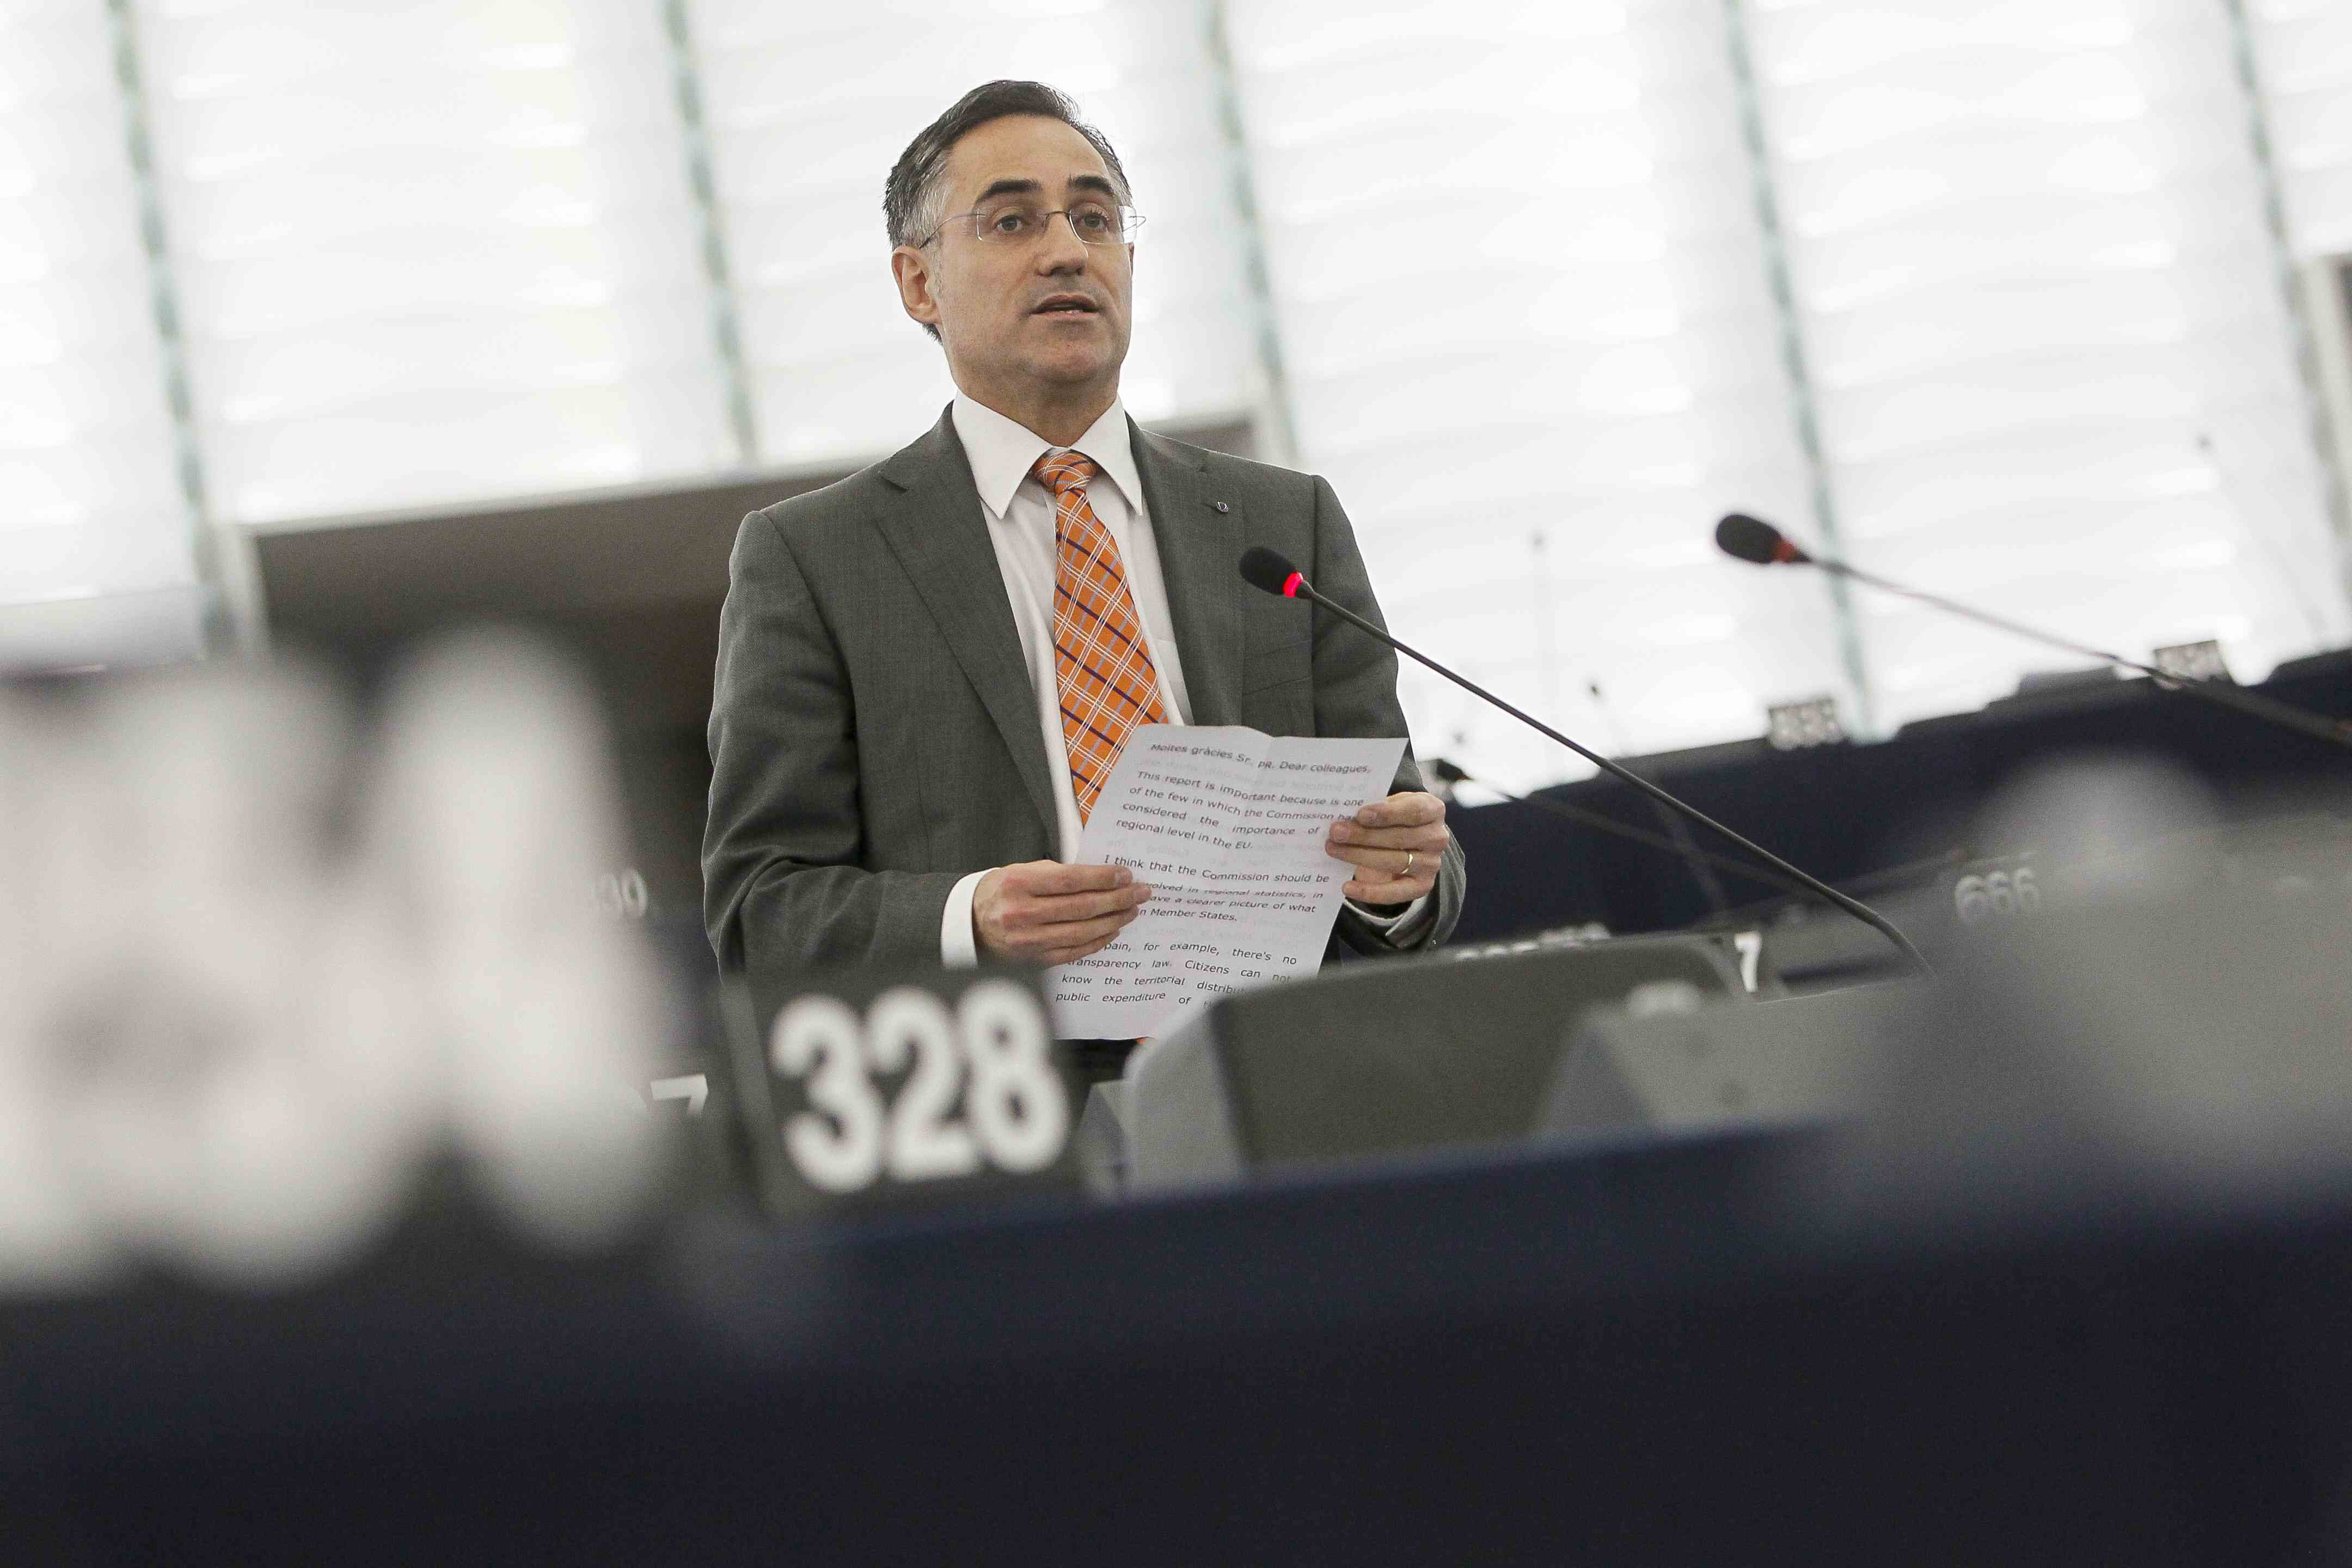 L'eurodiputat de CiU, Ramon Tremosa, a Brussel·les / PARLAMENT EUROPEU